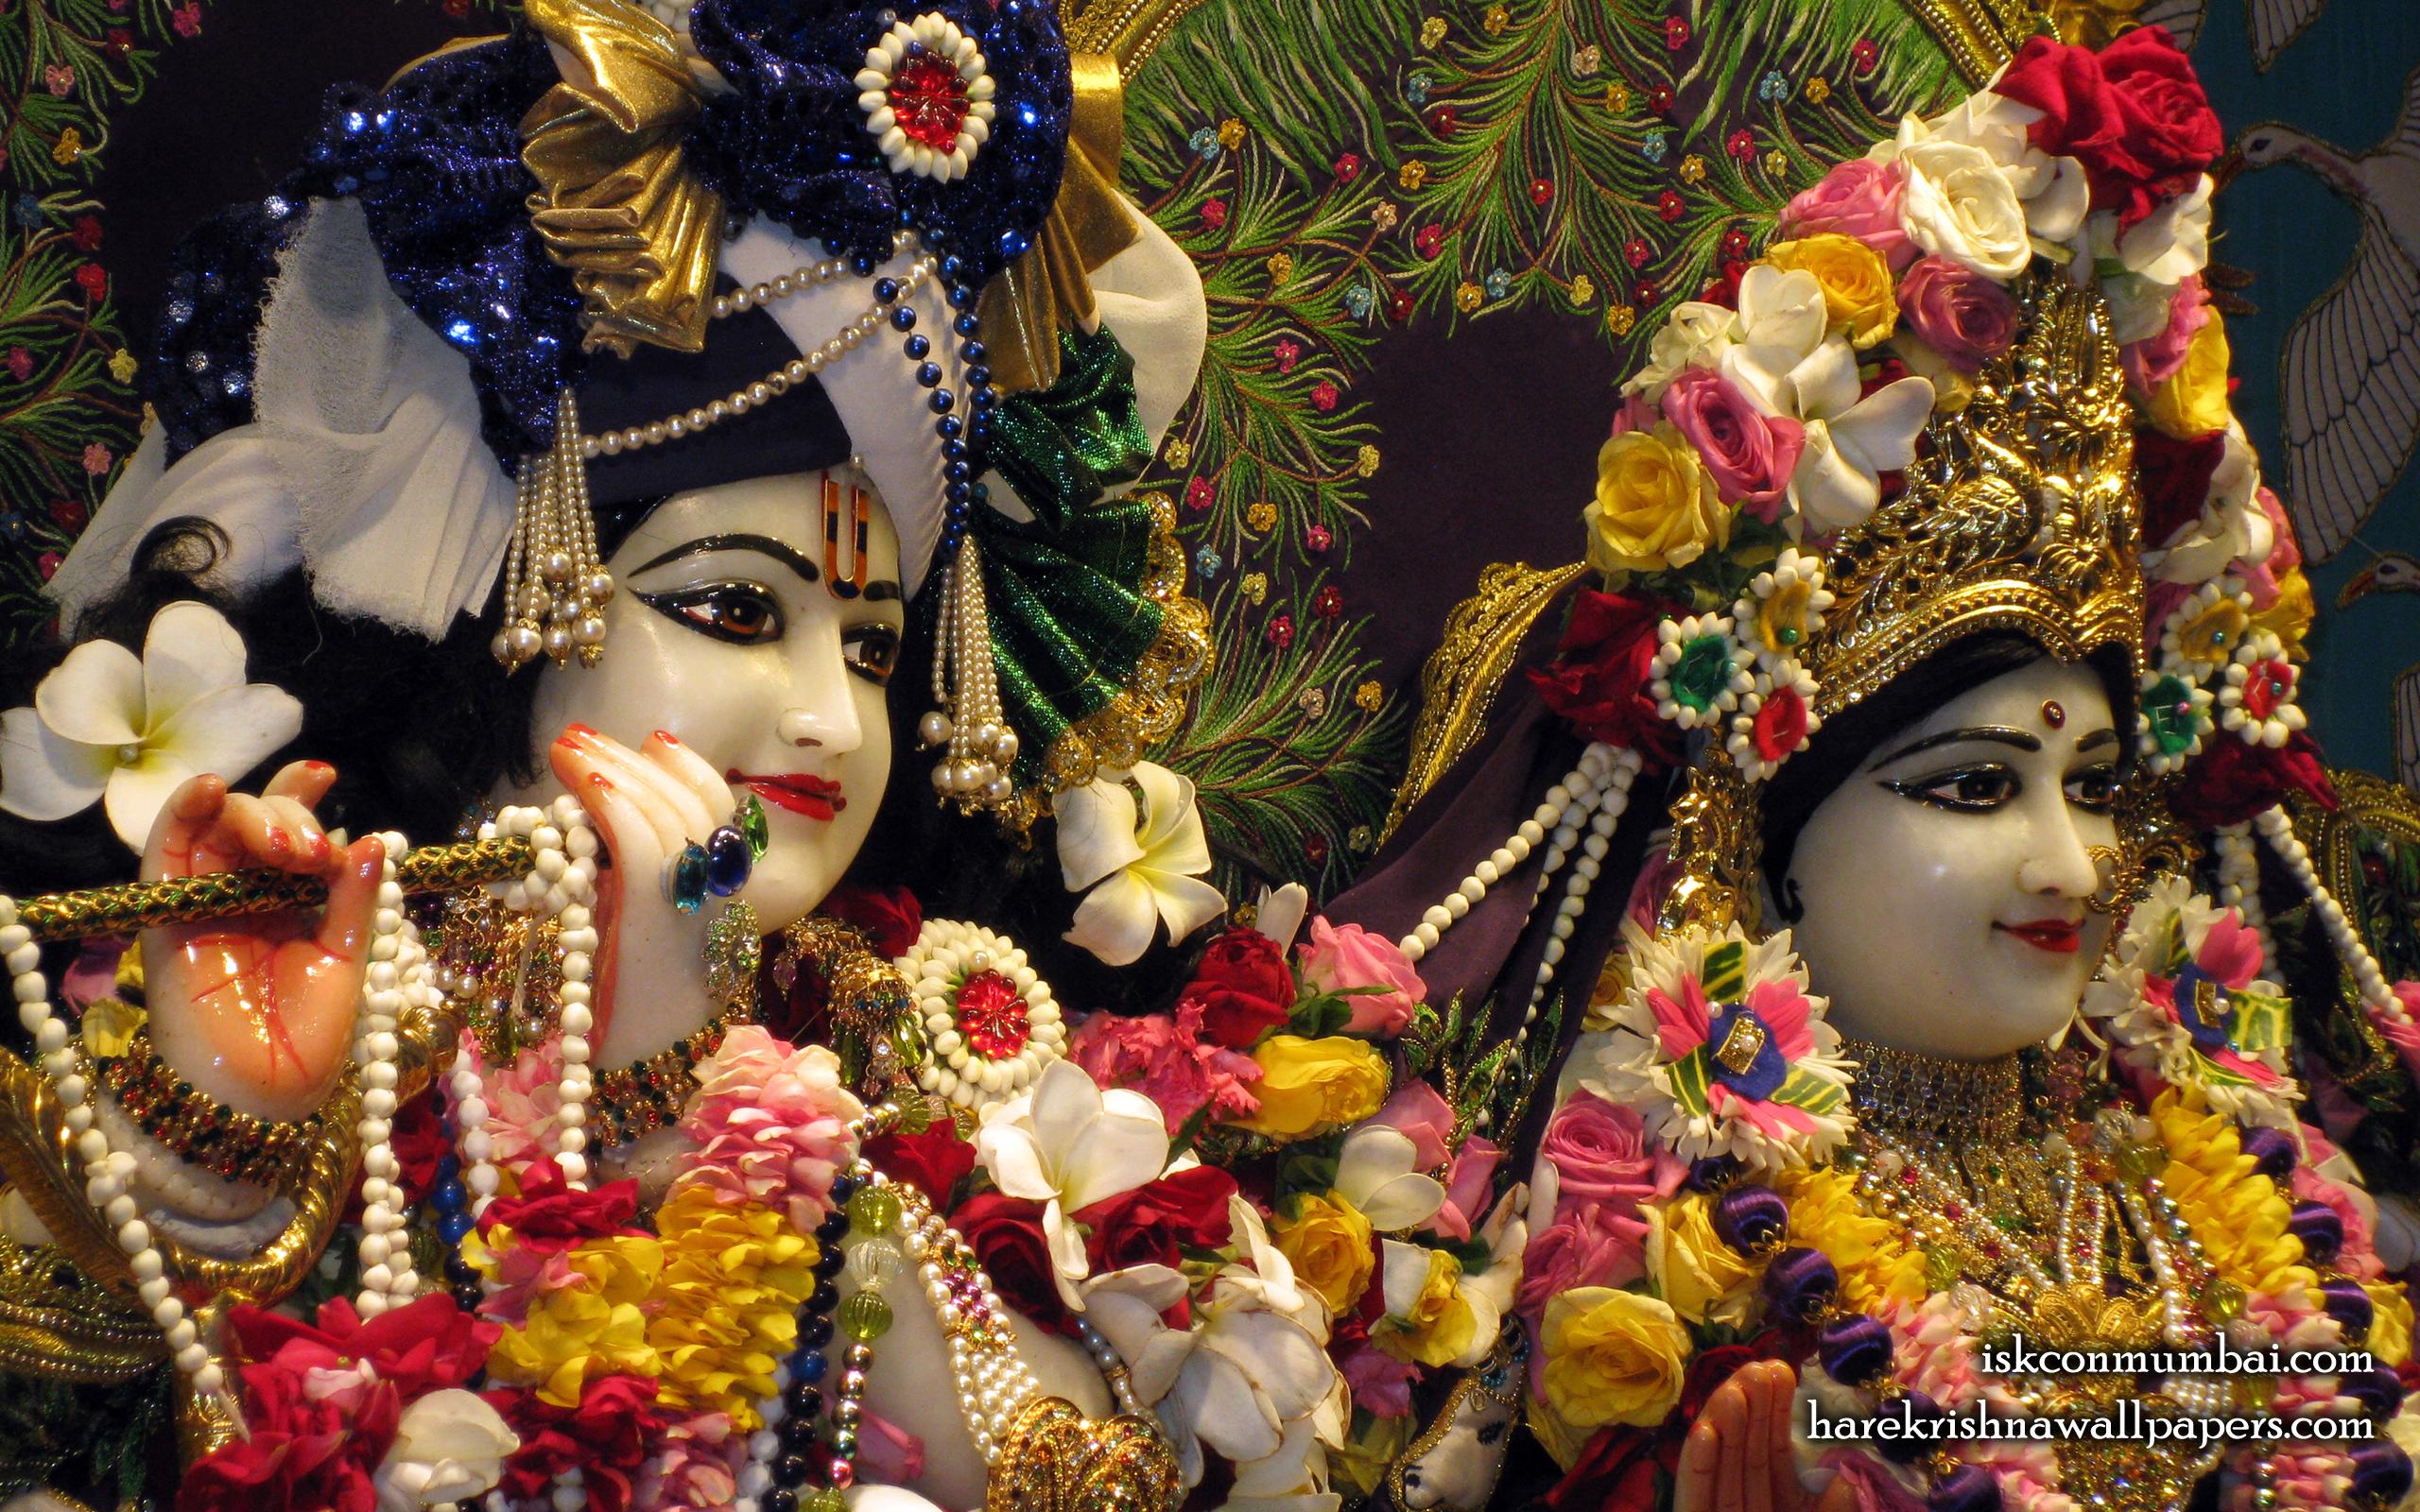 Sri Sri Radha Rasabihari Close up Wallpaper (022) Size 2560x1600 Download